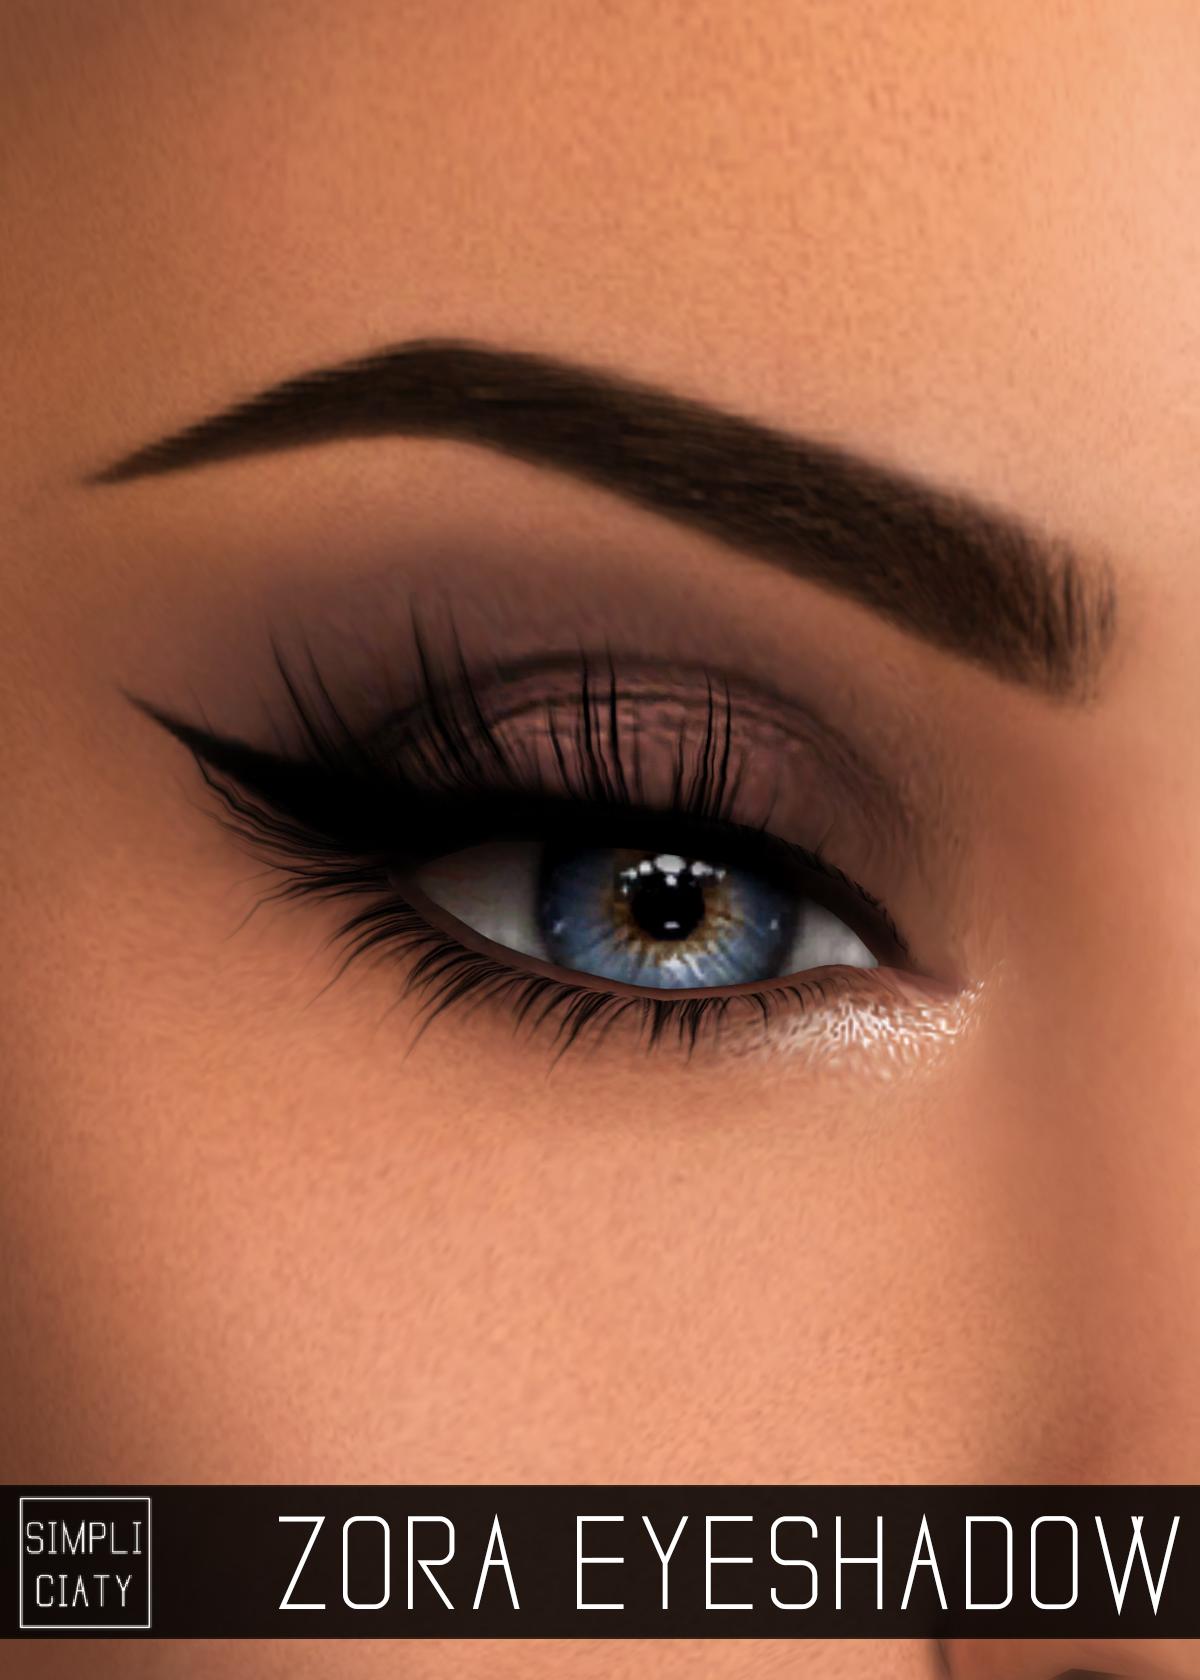 "simpliciaty-cc: ""ZORA EYESHADOW"" Simple natural eyeshadow ..."